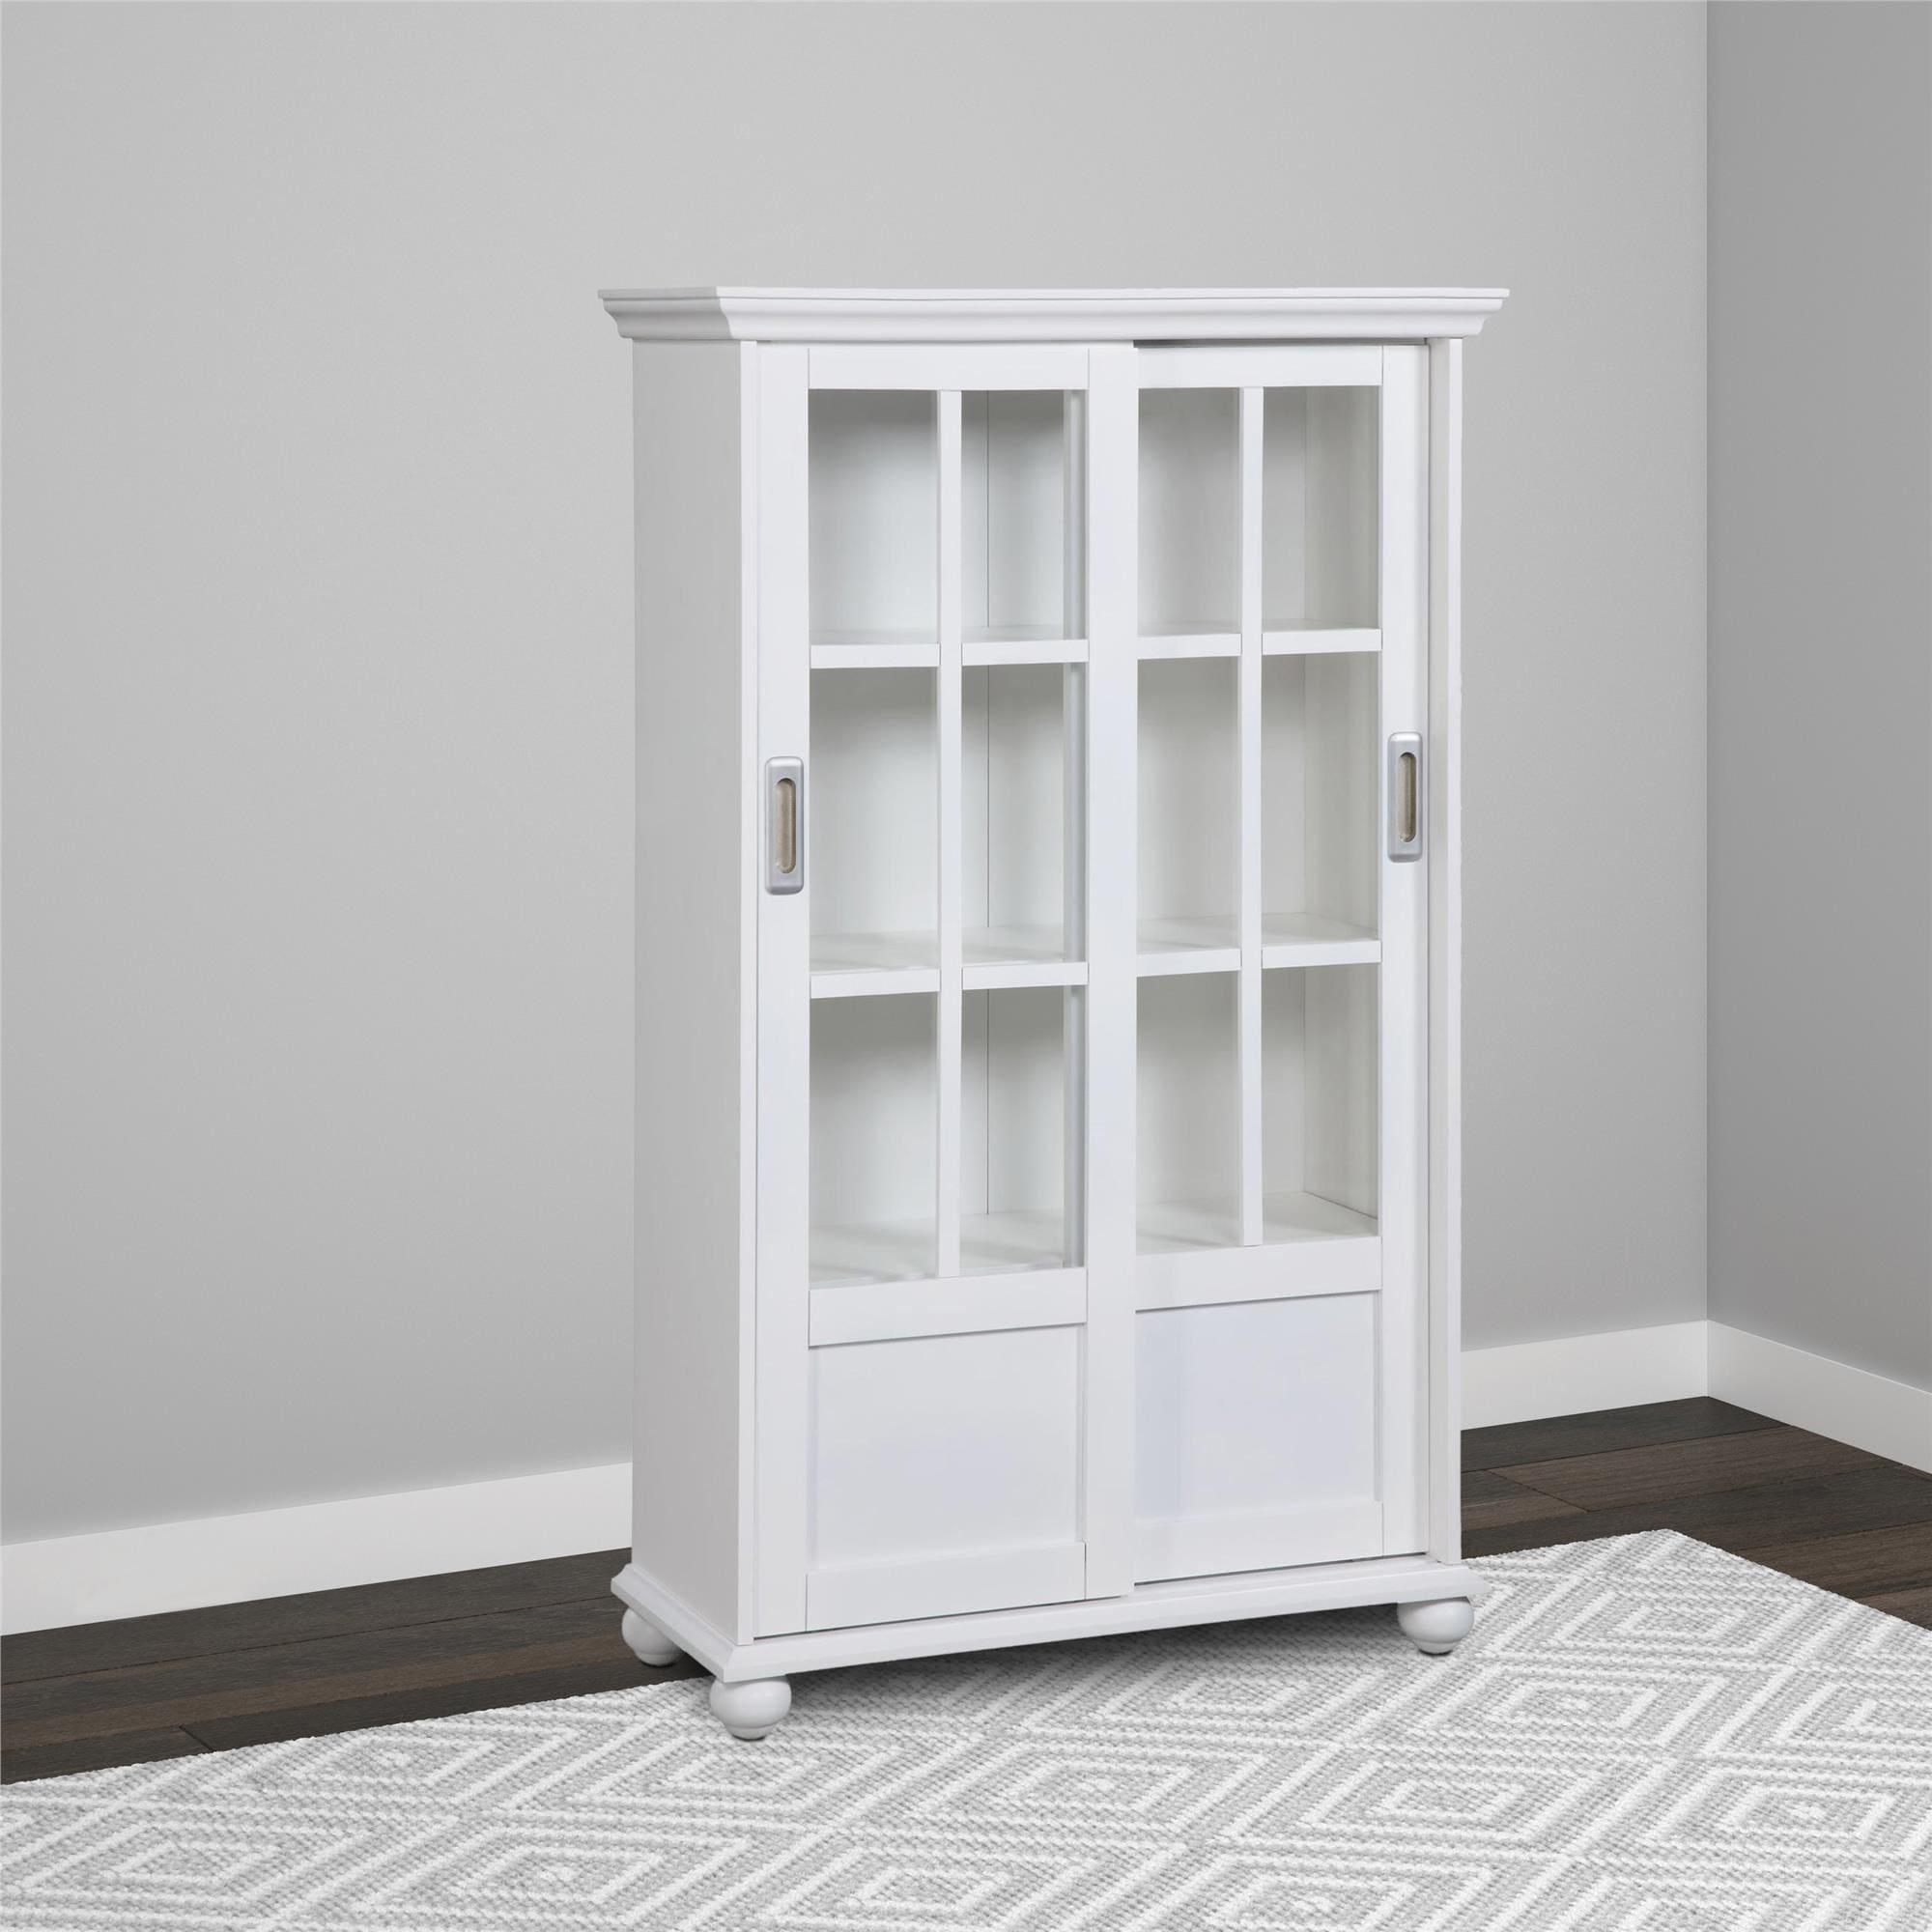 Avenue Greene Abbeywood Bookcase with Sliding Glass Doors